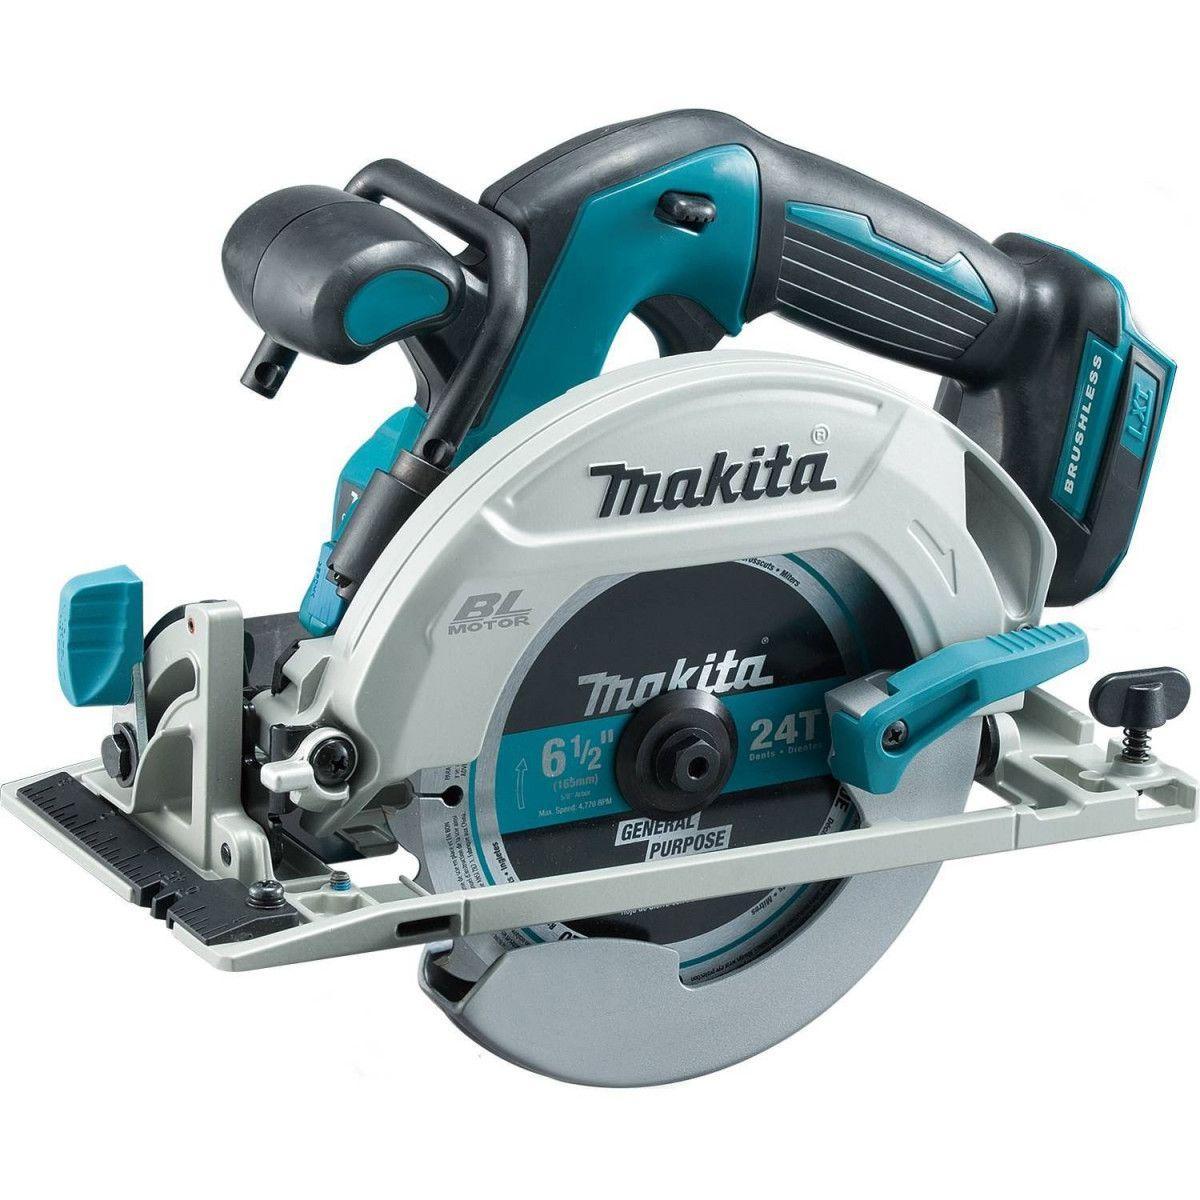 Makita Xsh03z 18v Lxt Brushless Cordless 6 1 2 Circular Saw Tool Only Cordless Circular Saw Makita Tools Saw Tool